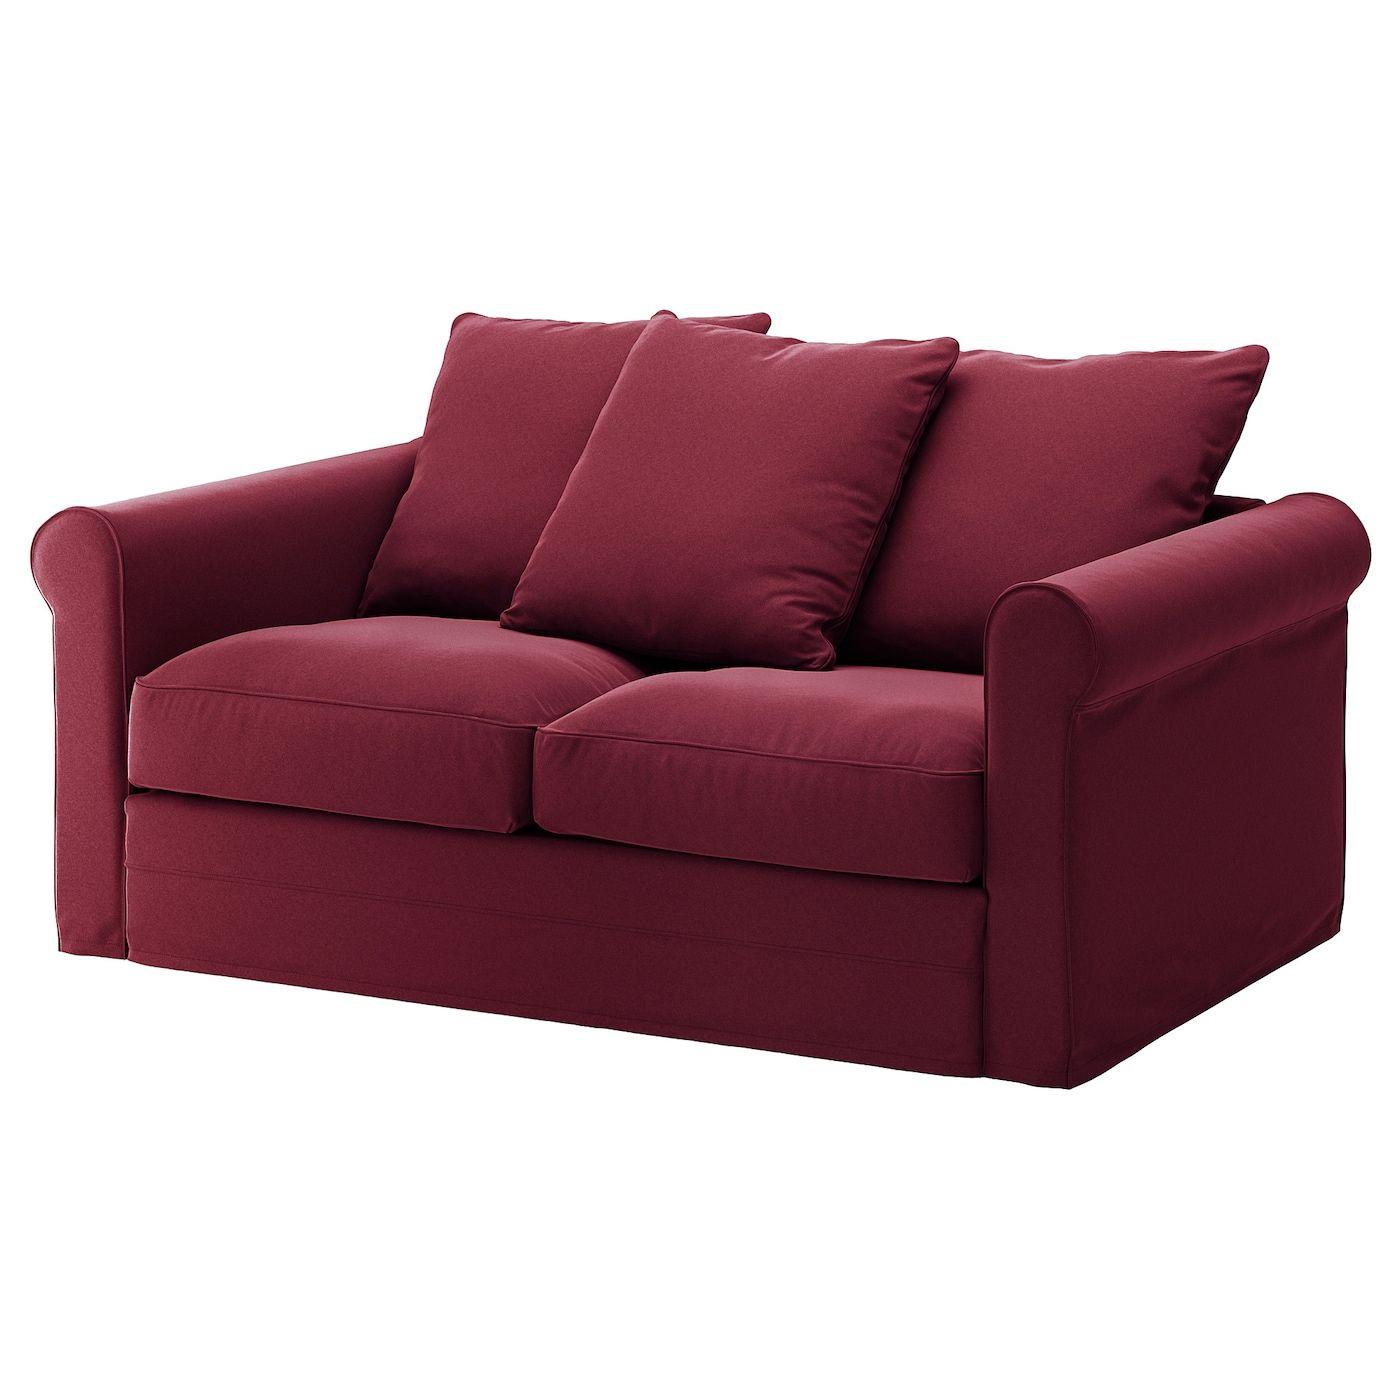 Ikea Gronlid Loveseat Ljungen Dark Red 2er Sofa Bettsofa Sofa Stoff